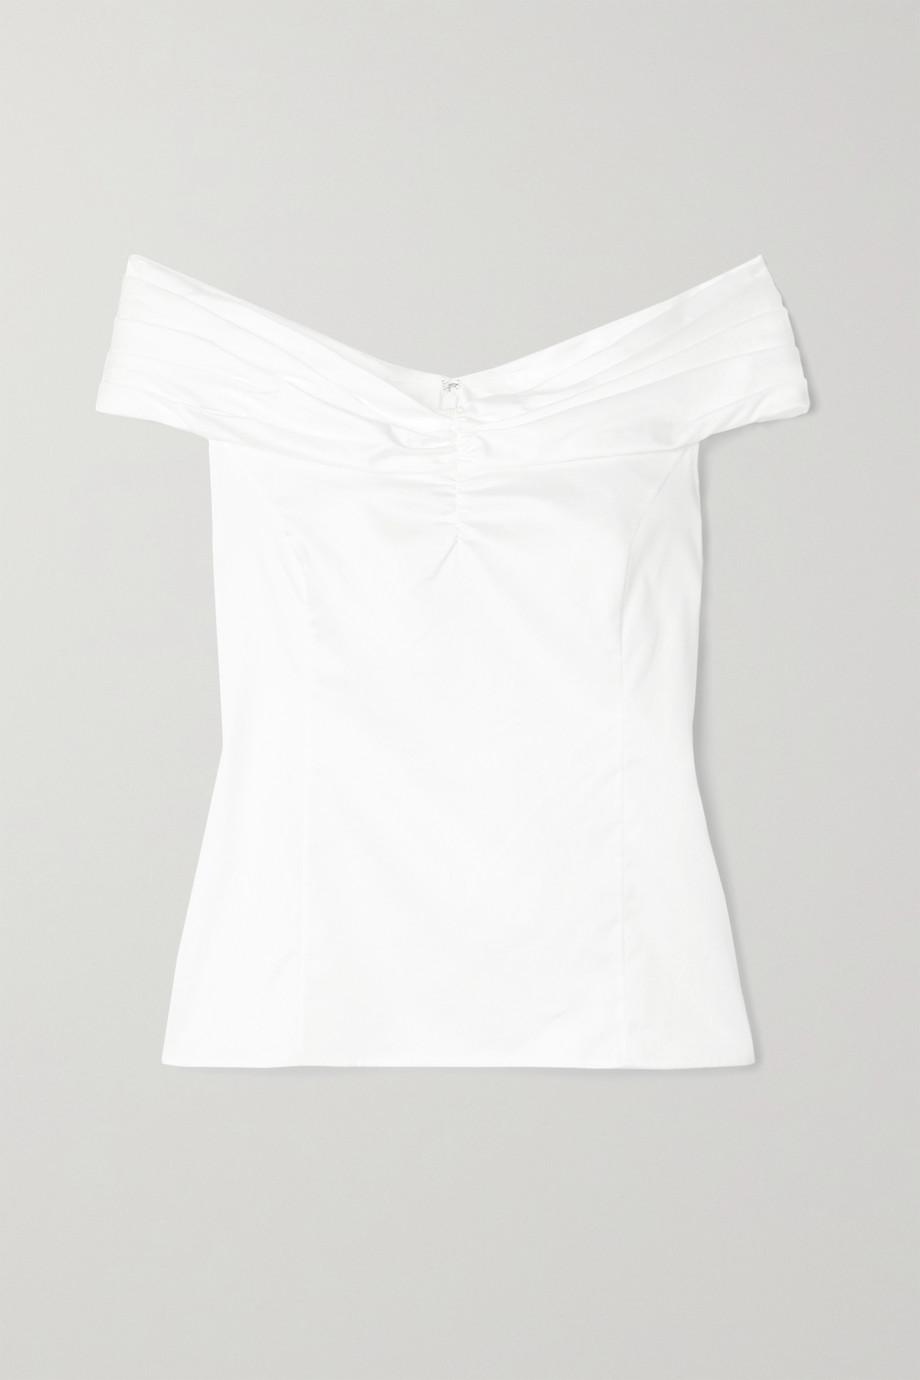 Jason Wu Collection 露肩褶饰纯棉府绸上衣